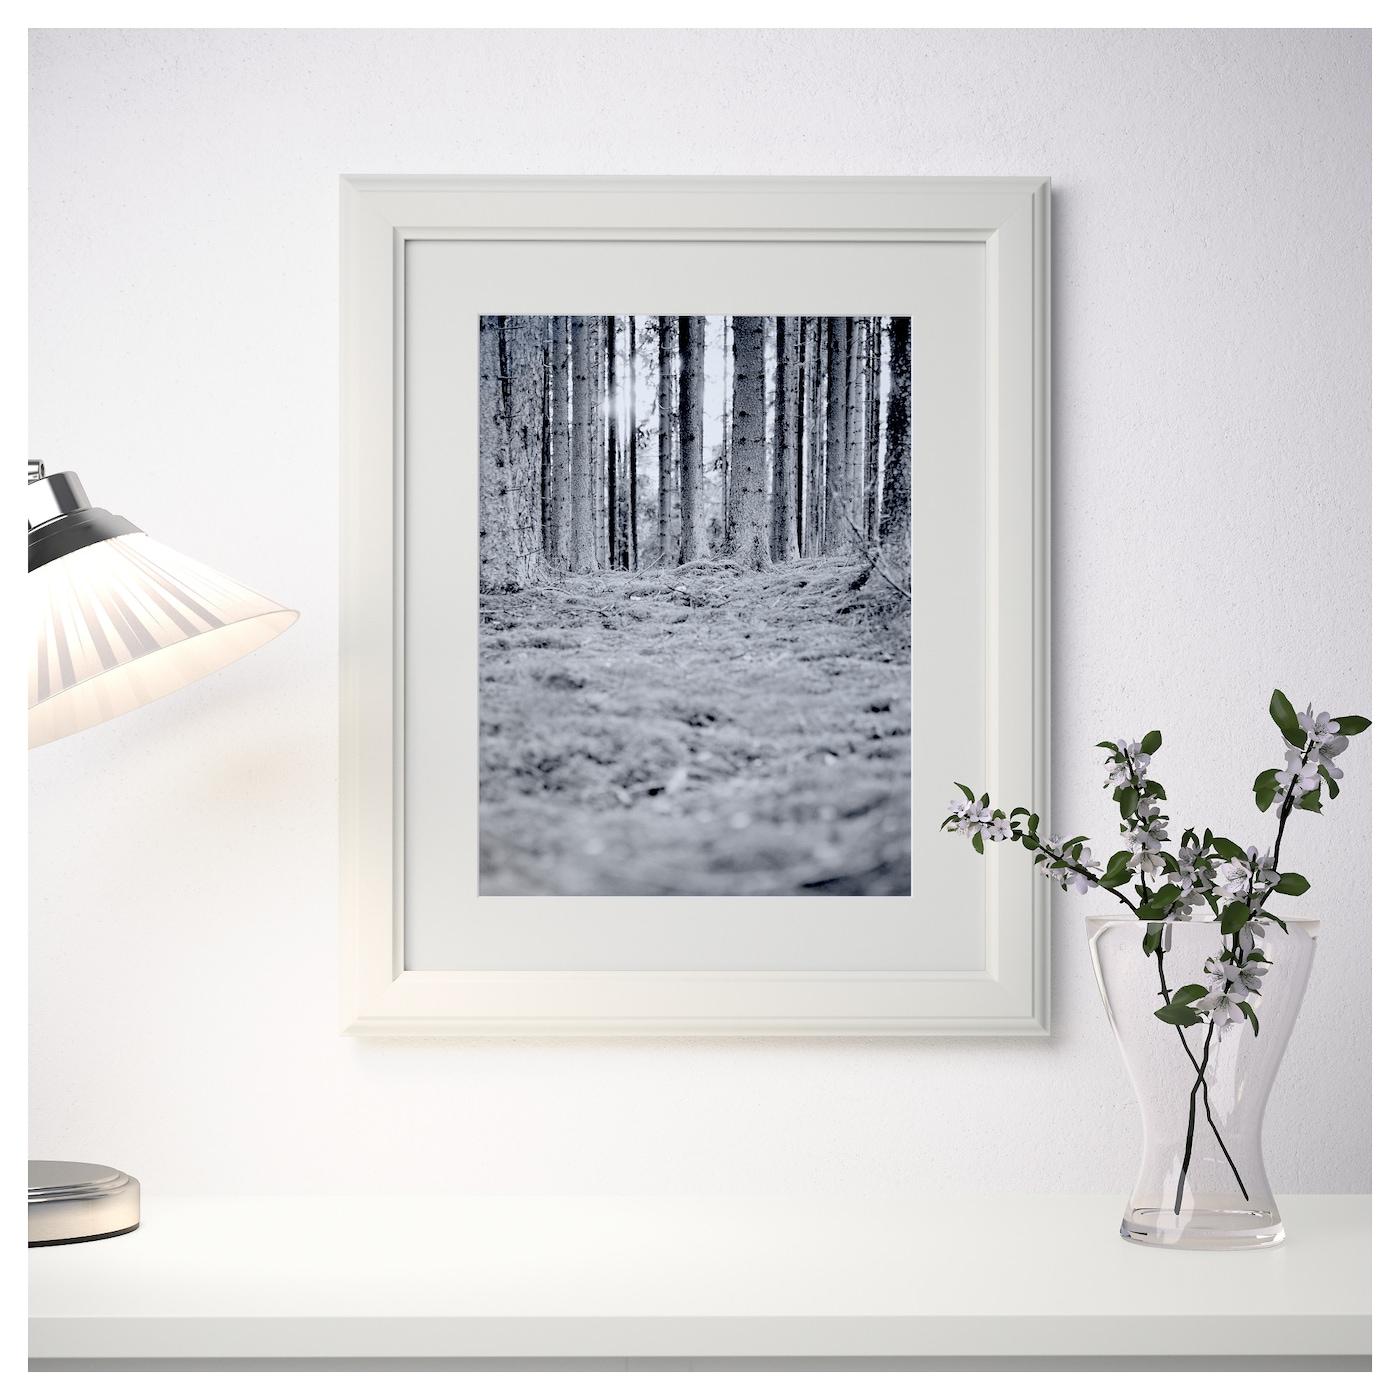 VIRSERUM Frame White 40x50 cm - IKEA